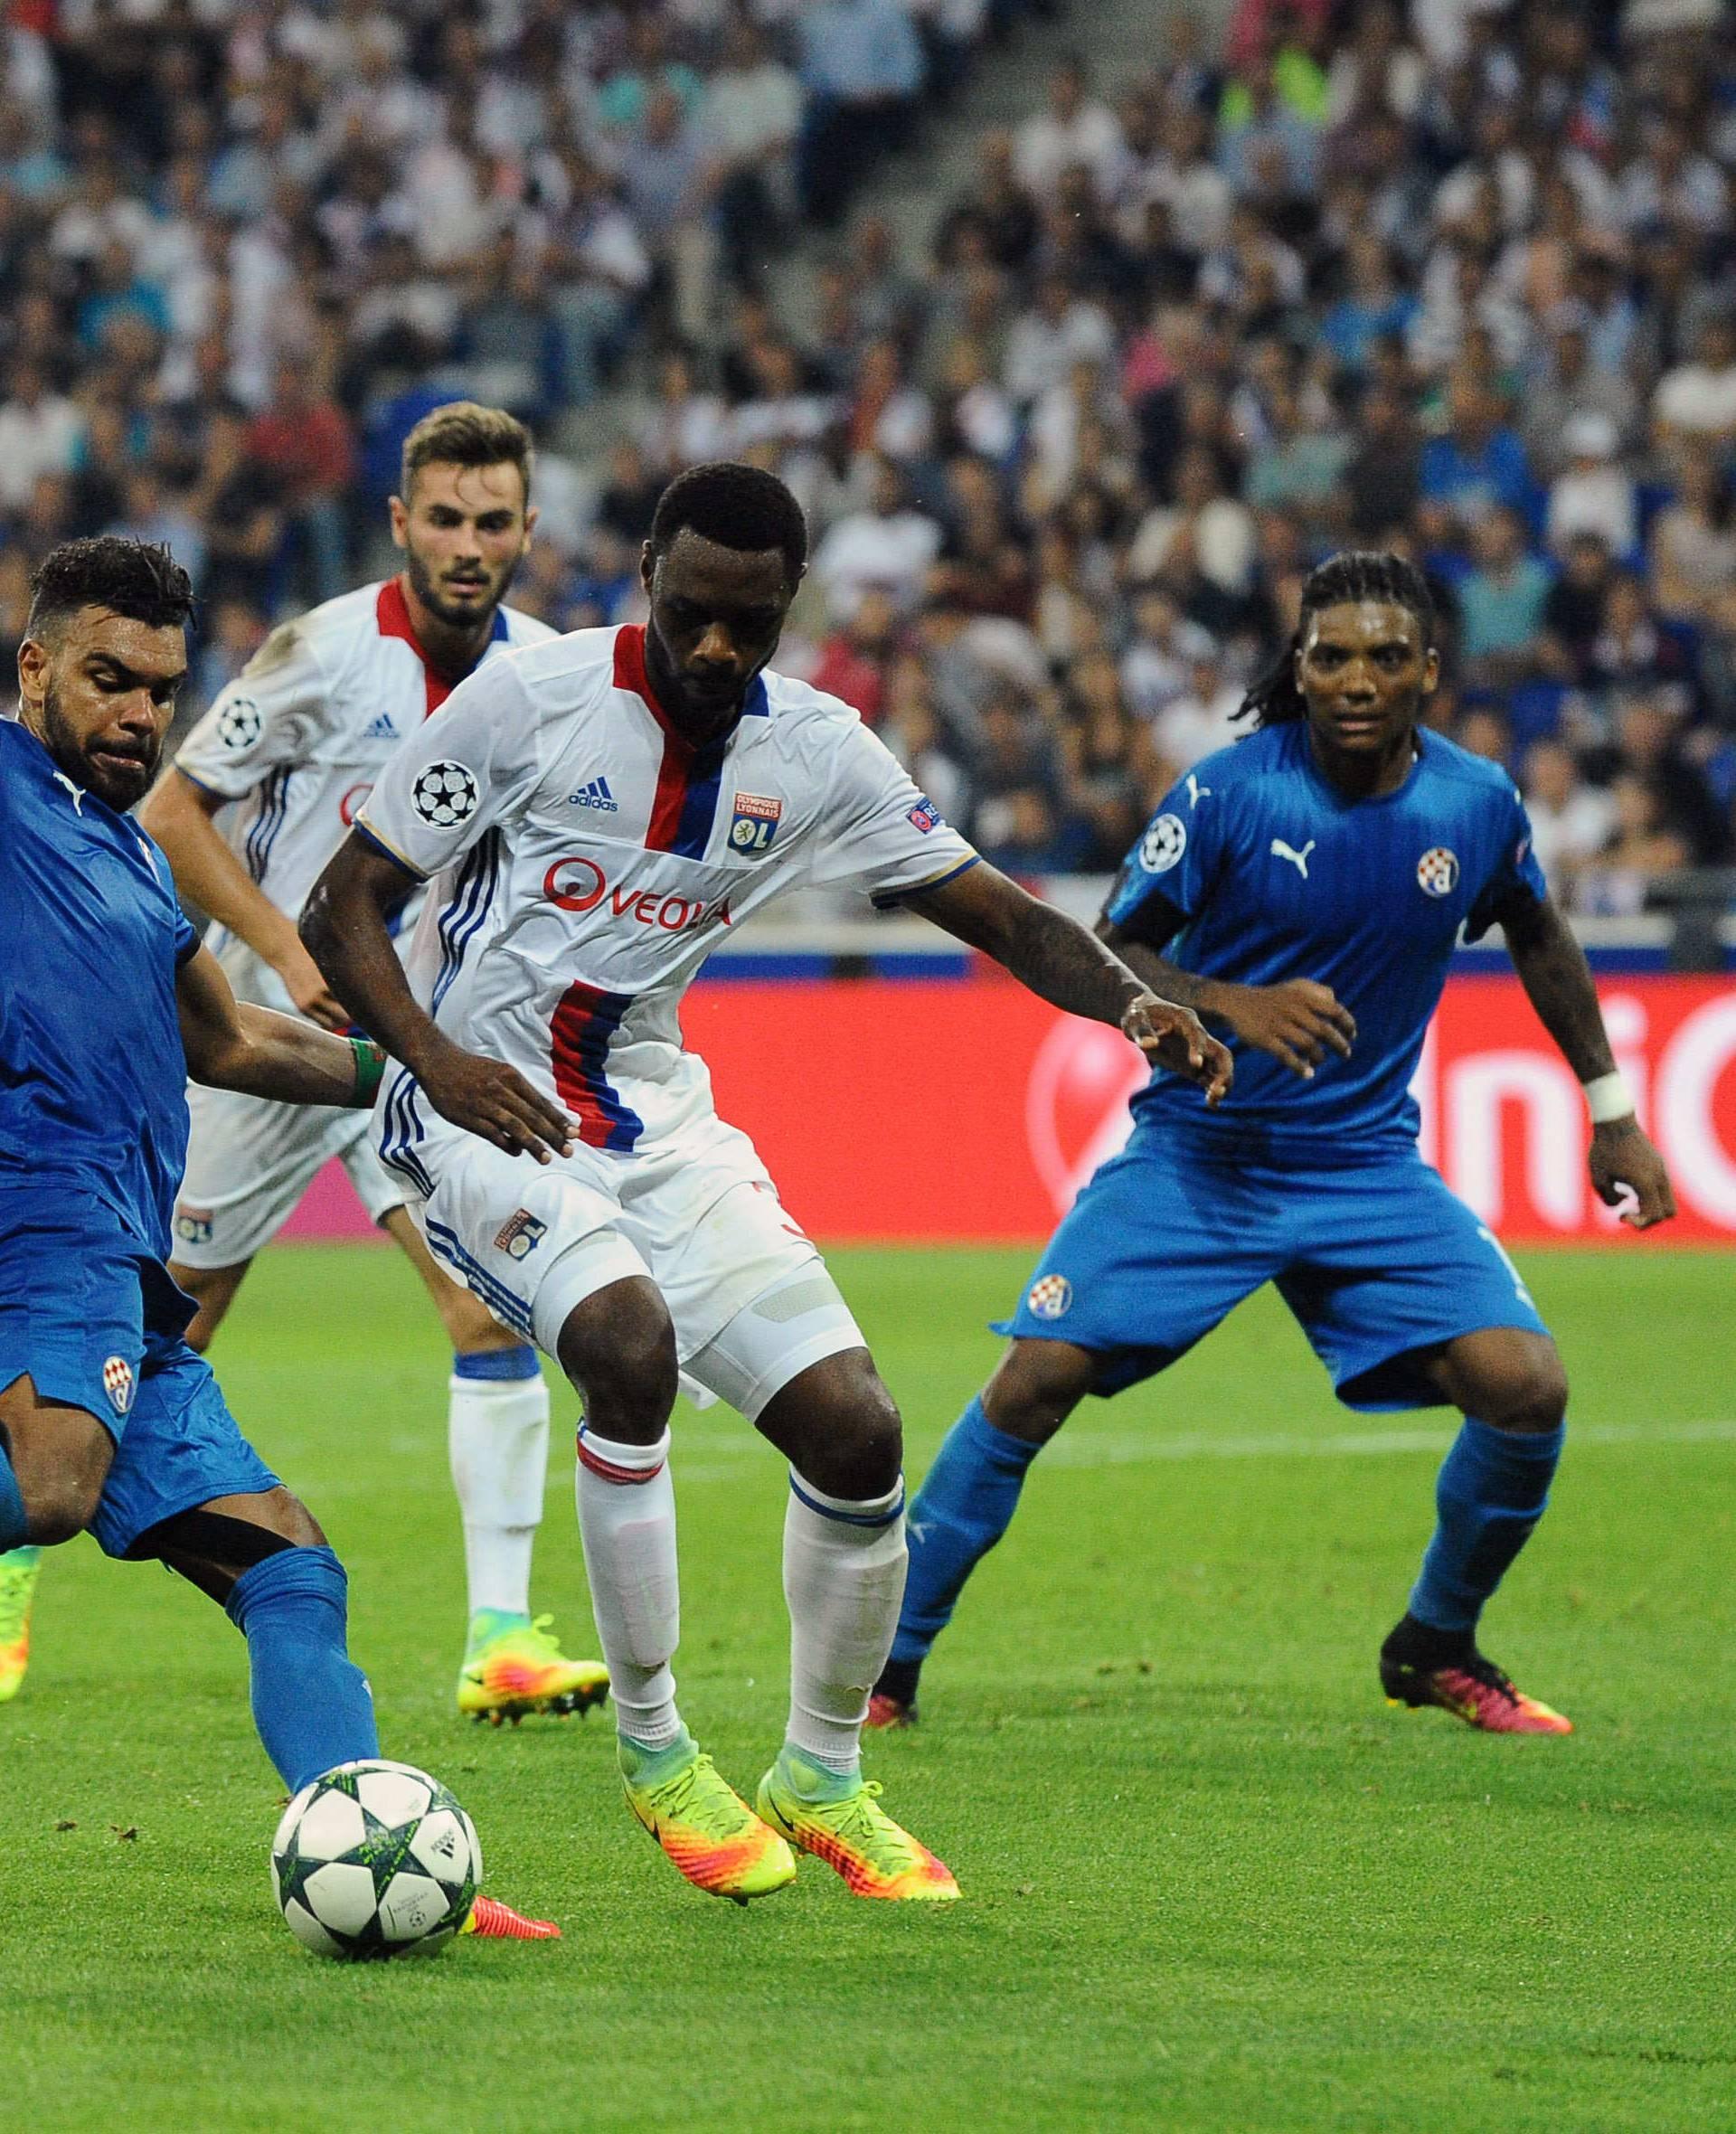 Olympique Lyonnais v Dinamo Zagreb